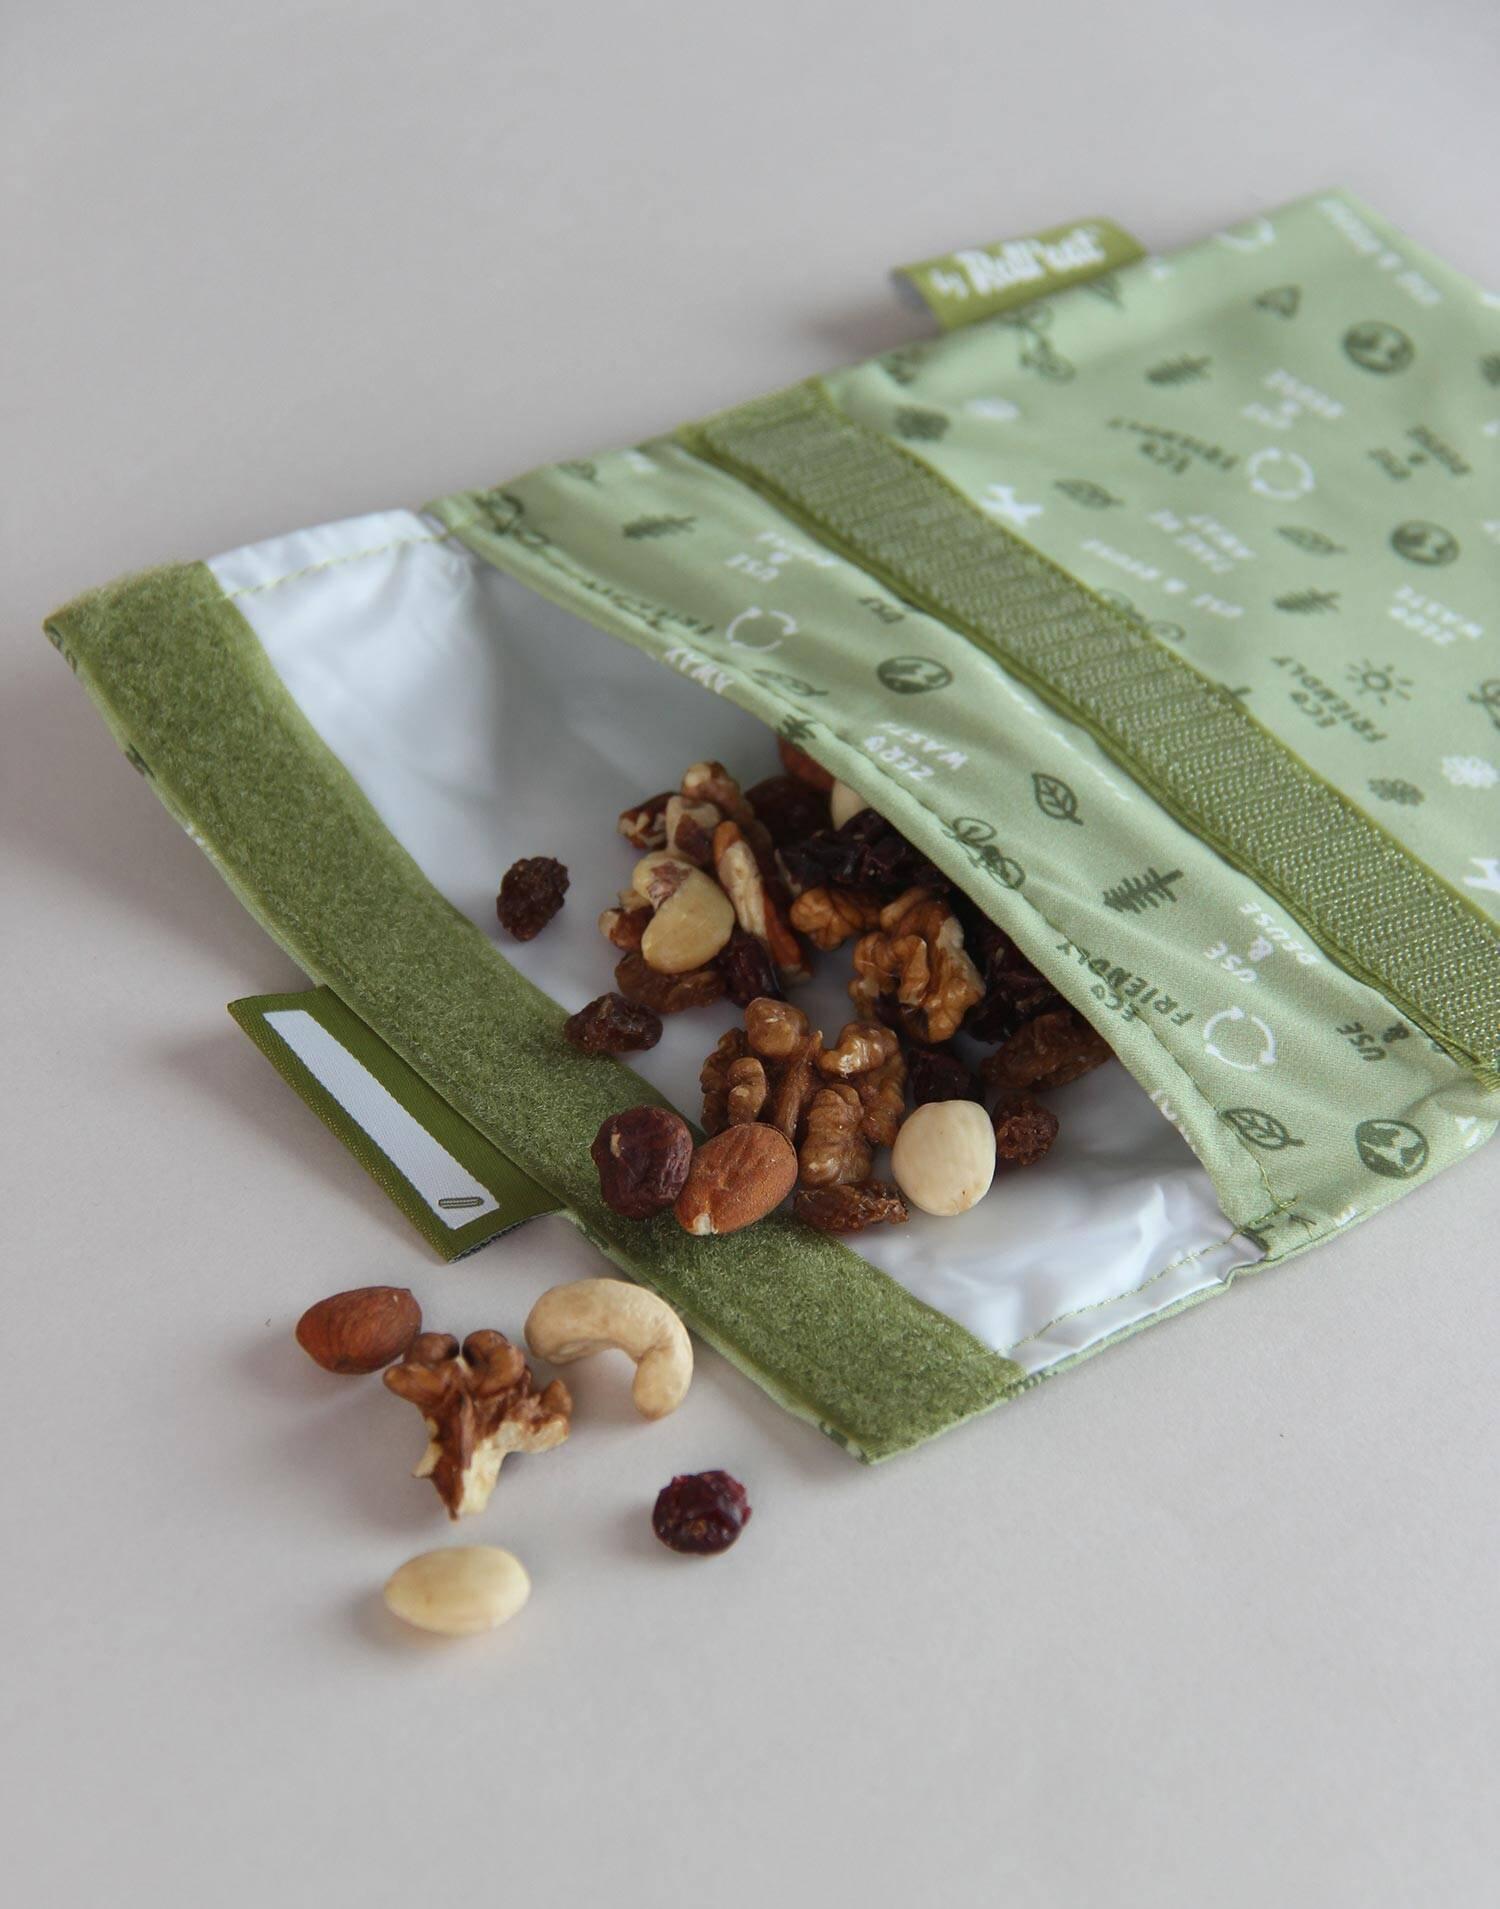 Porta snack reutilizable